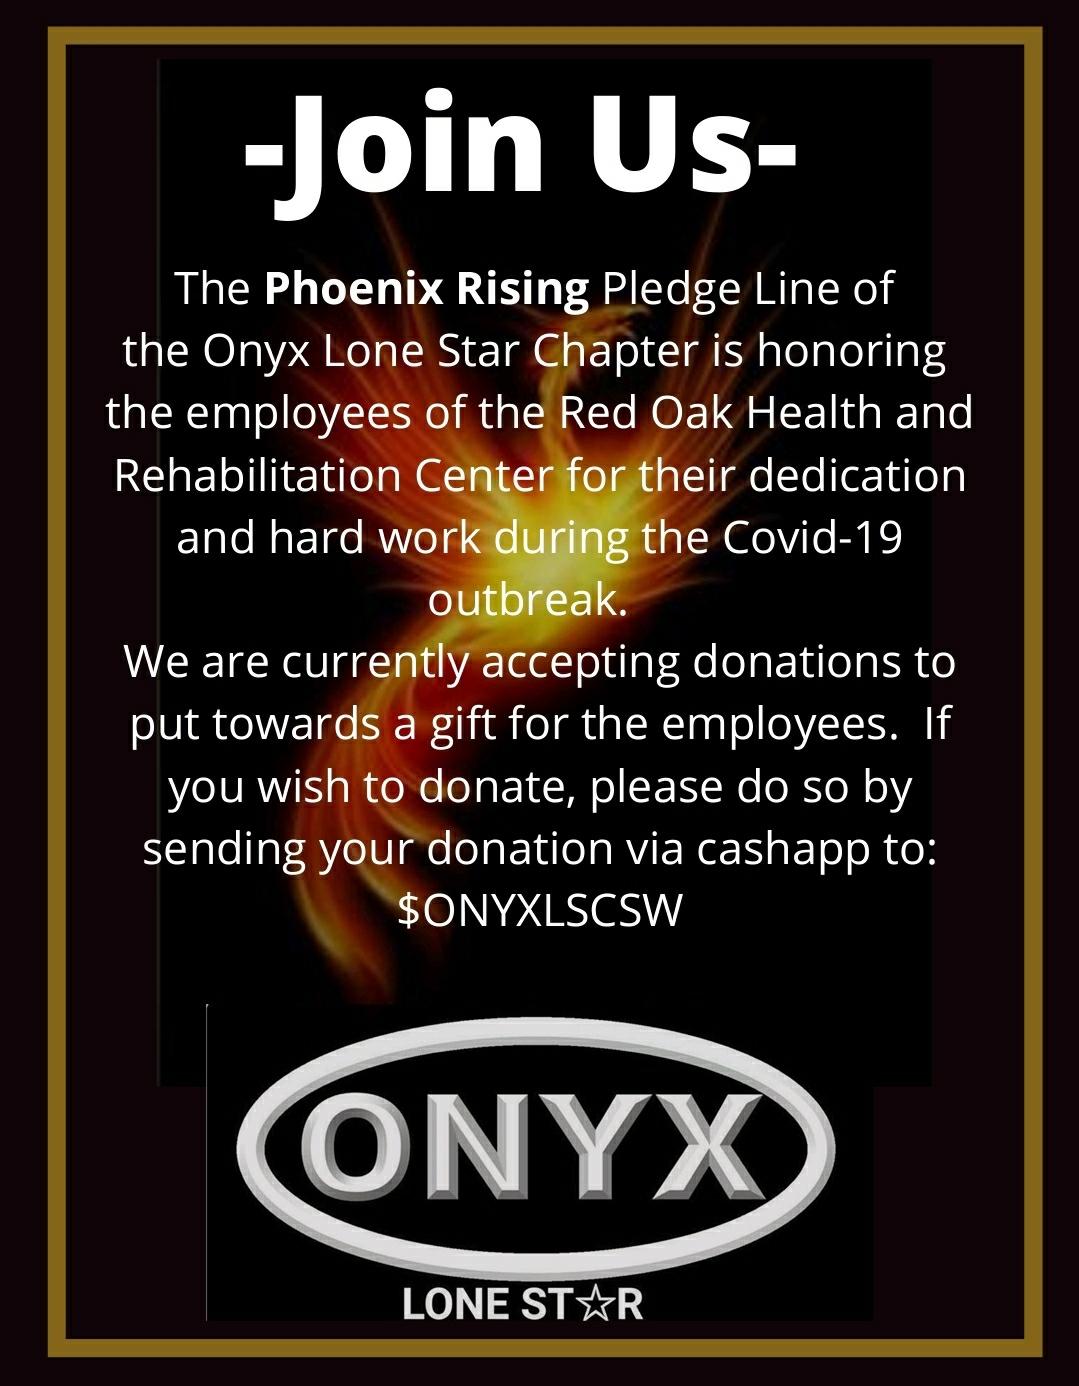 phoenix rising pledge line - fundraiser